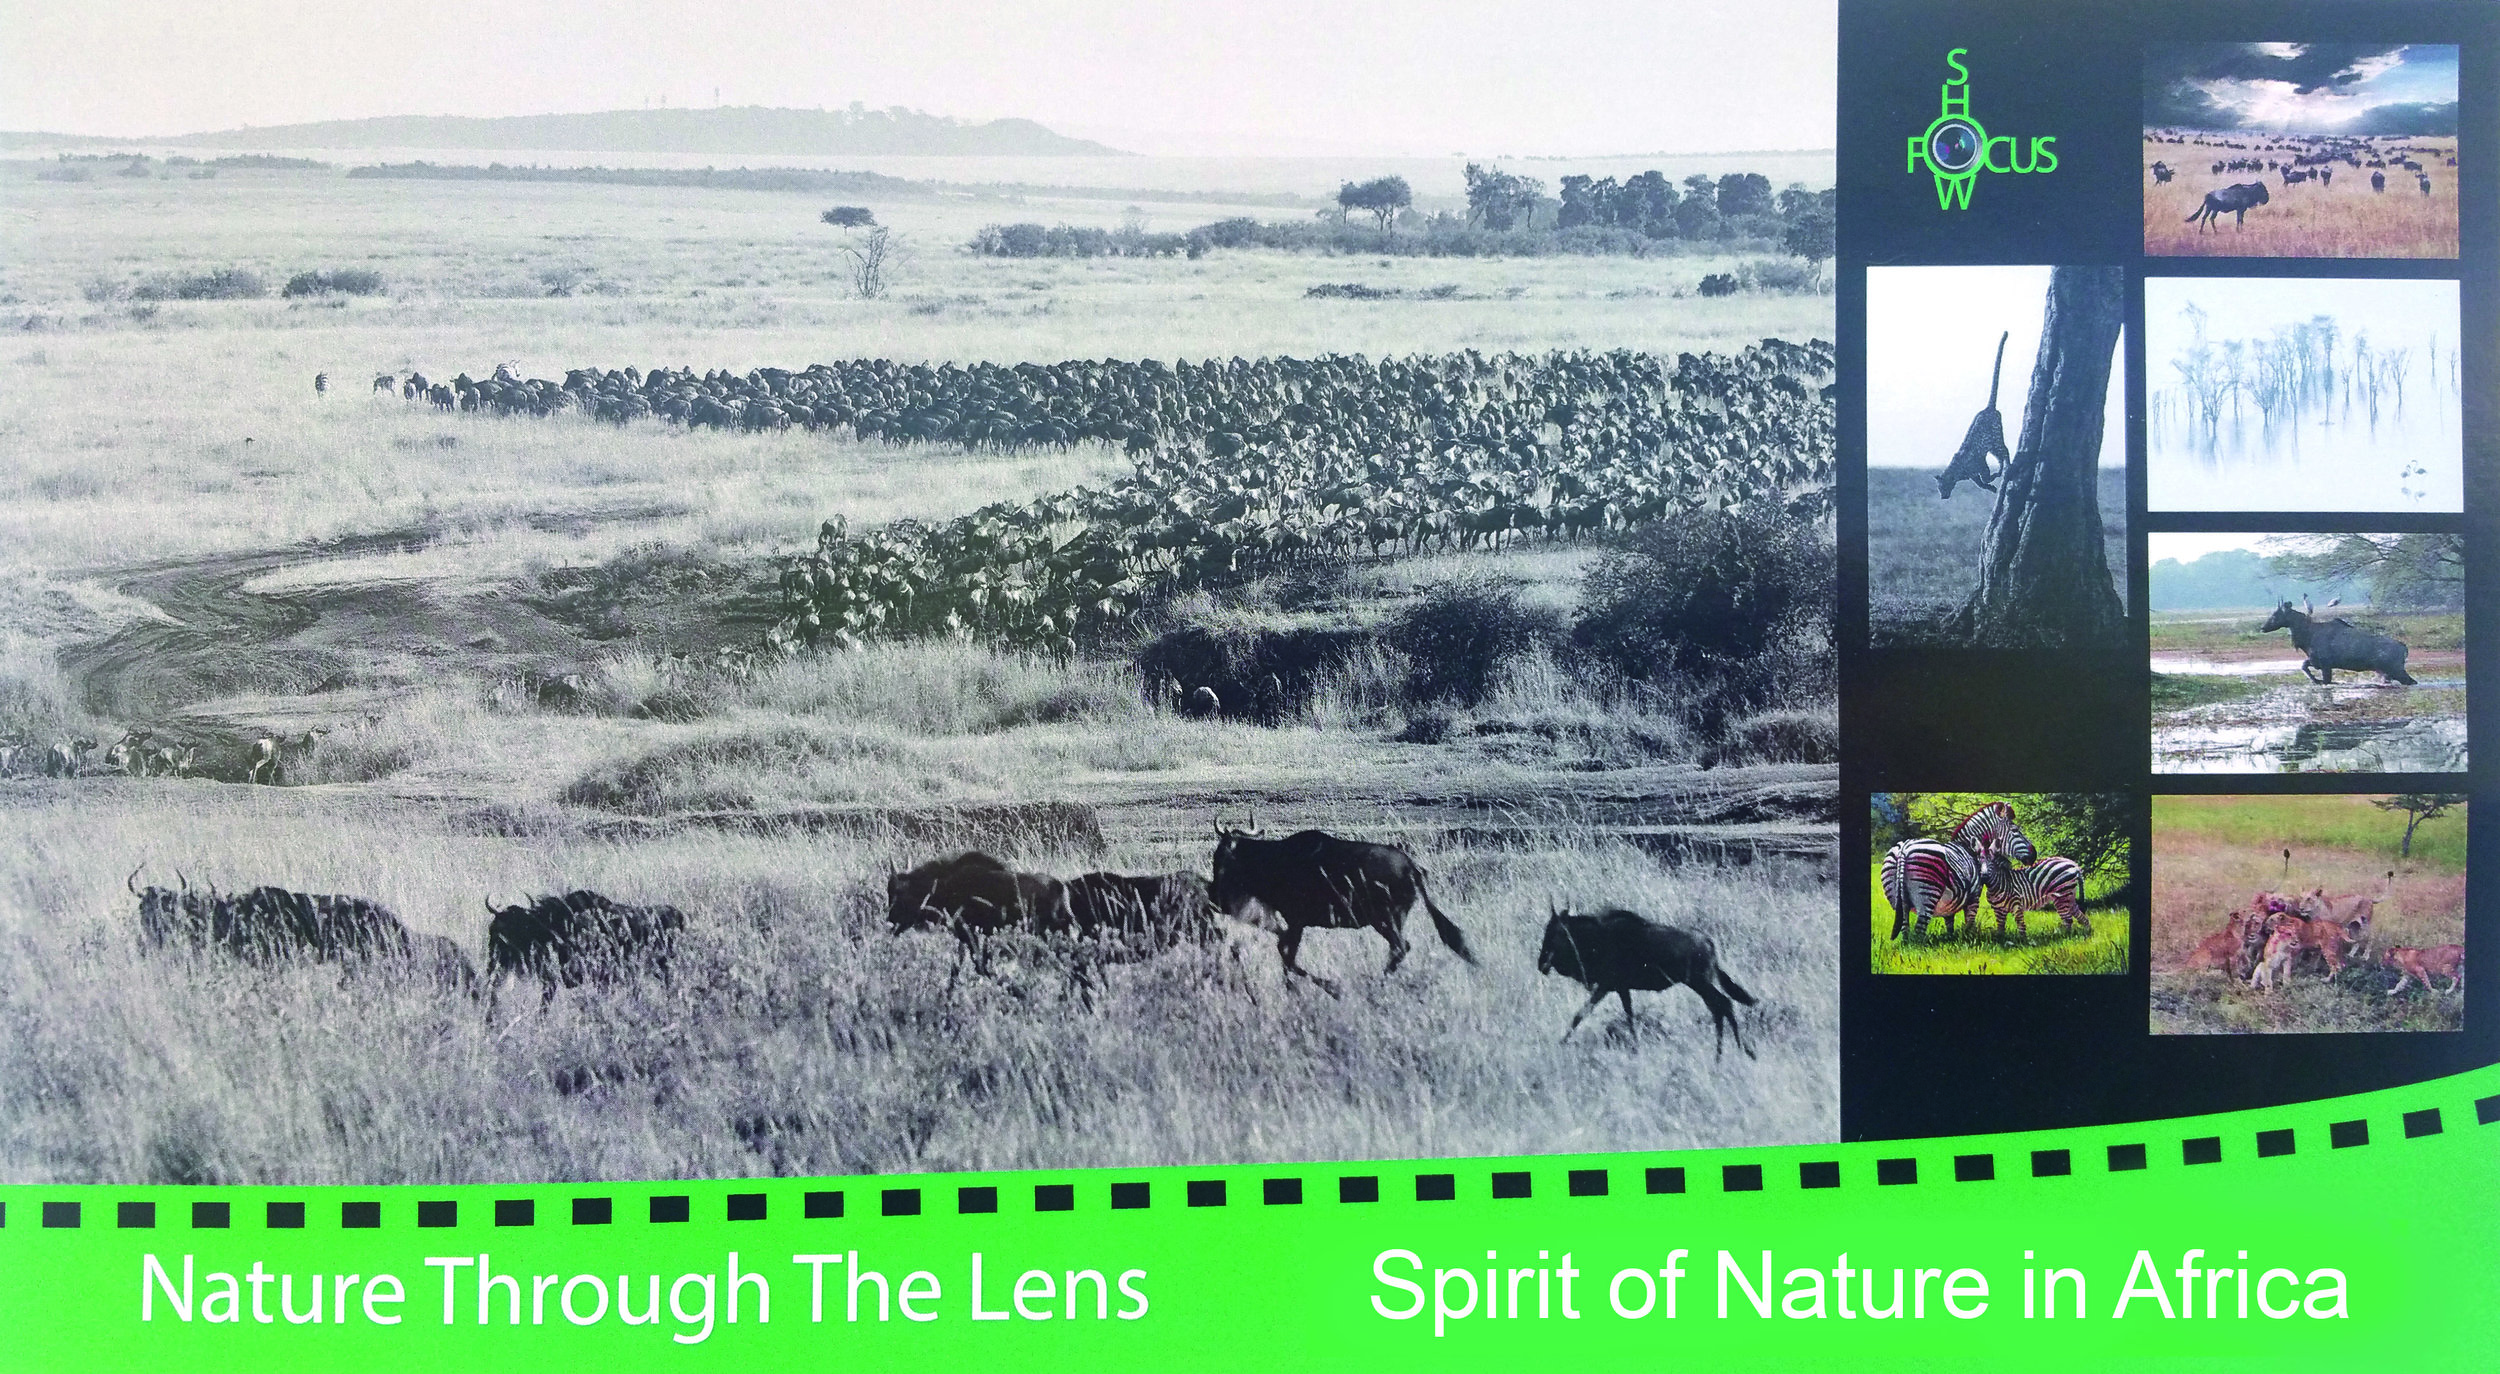 Postcard_Spirit_of_Nature_in_Africa_front_20180130_OGM.jpg